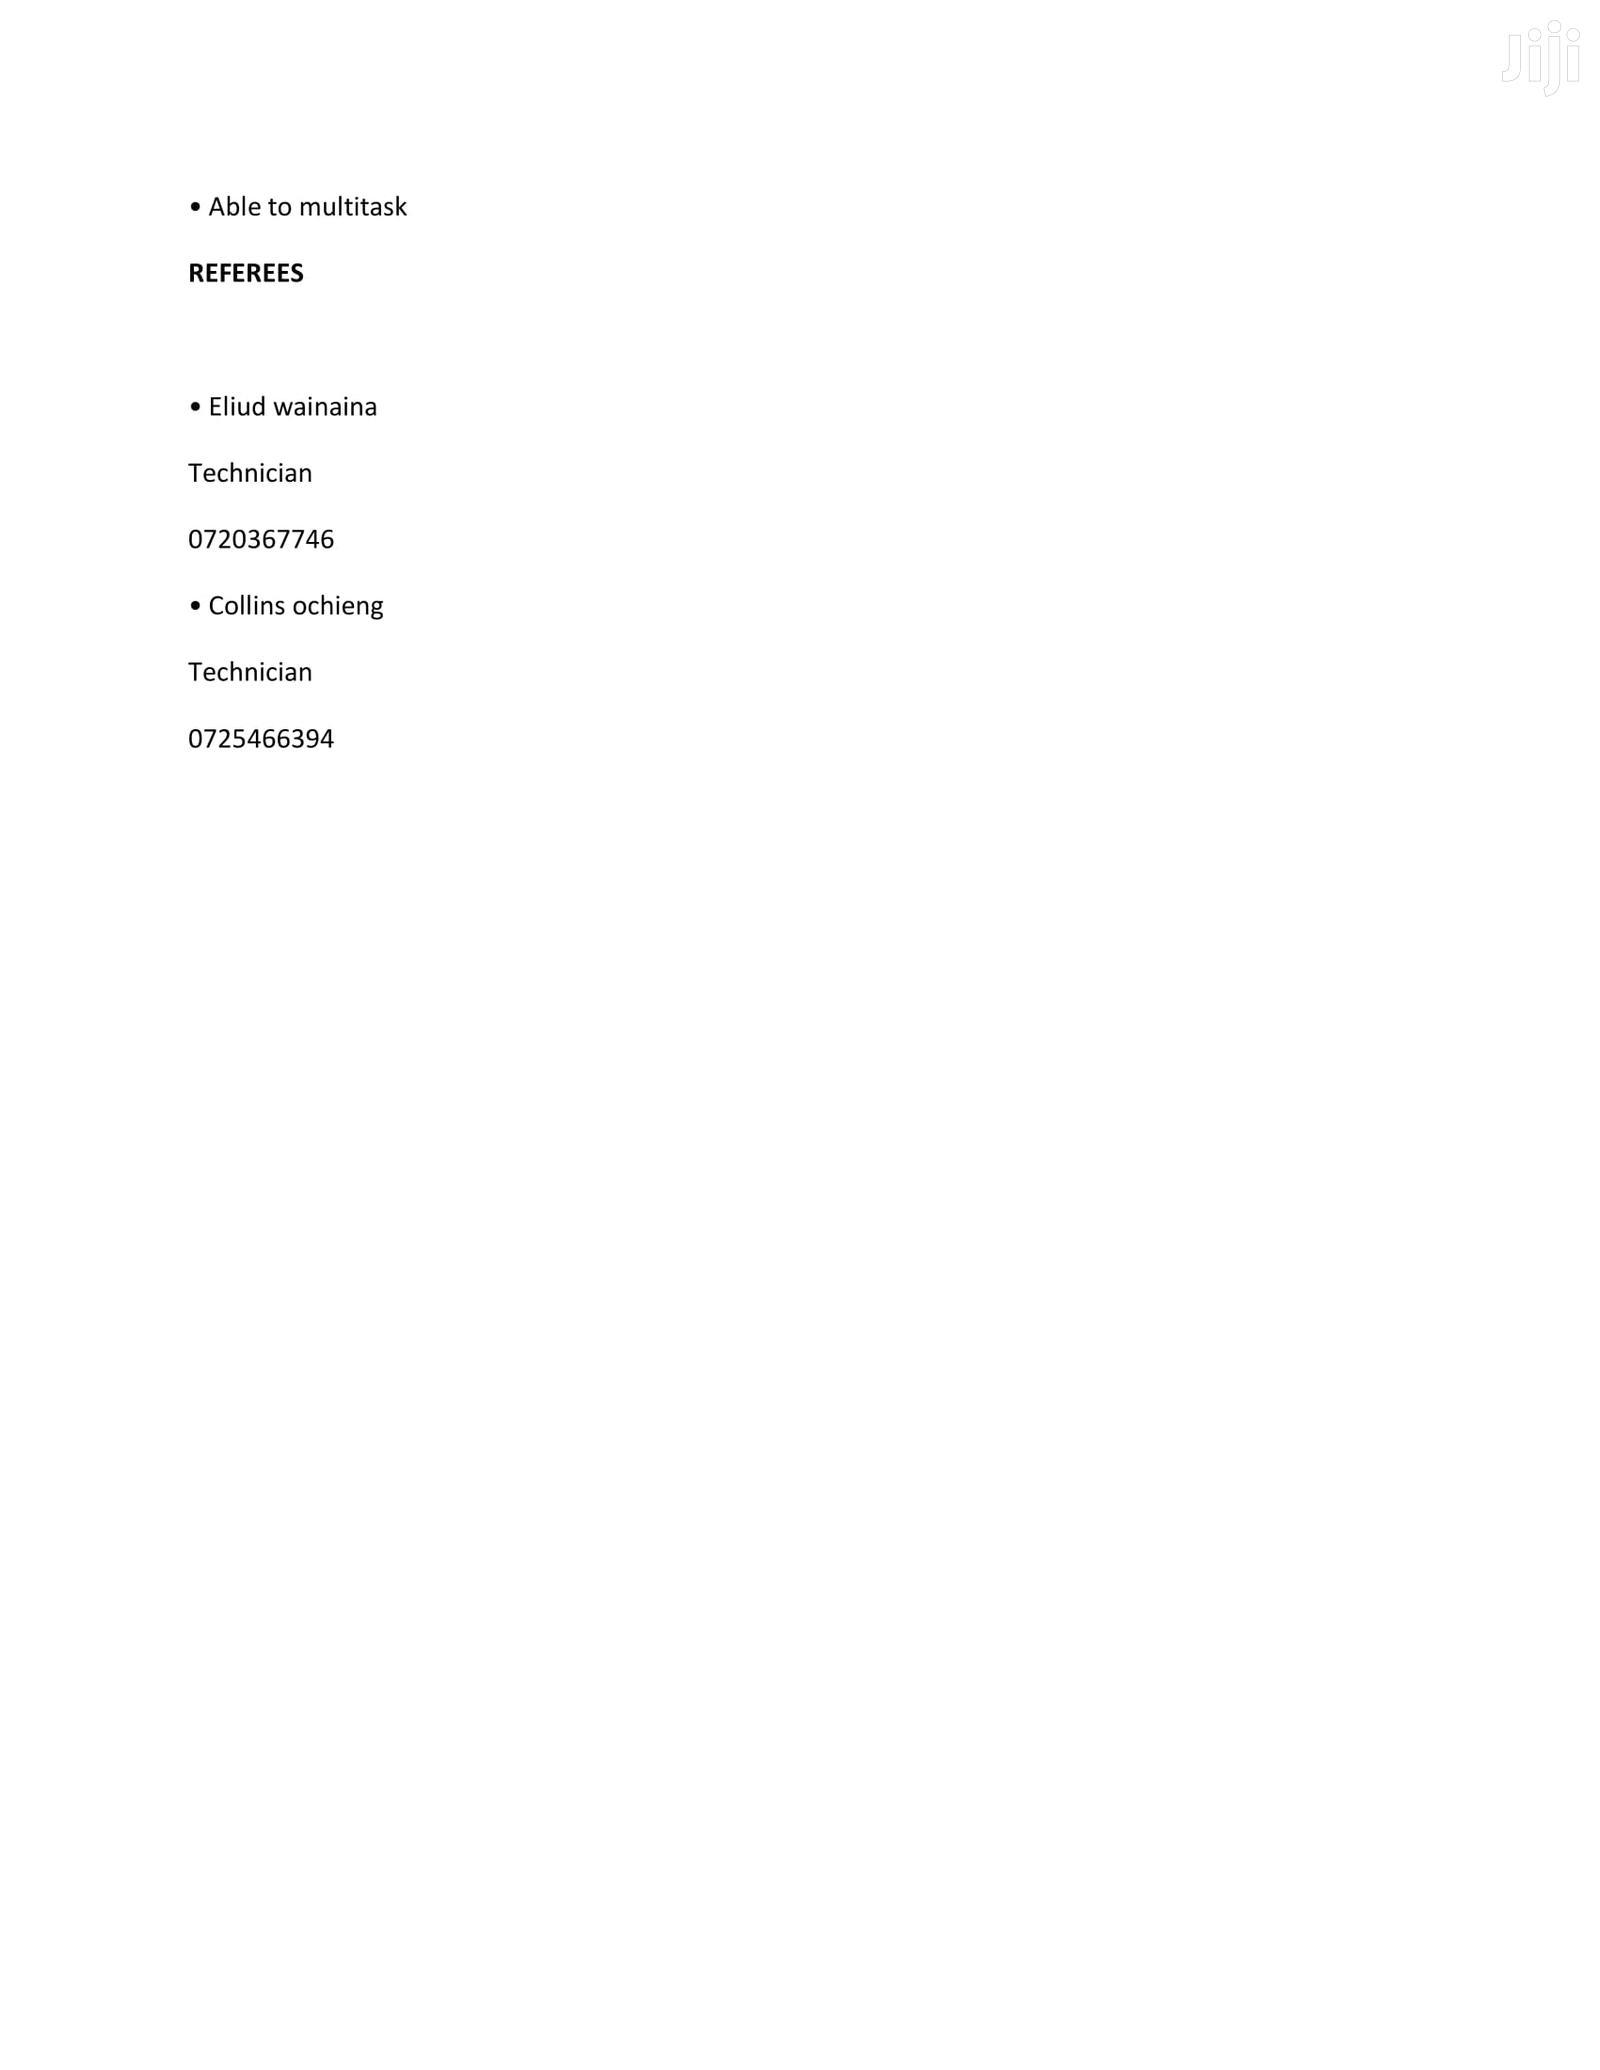 Sales & Telemarketing CV